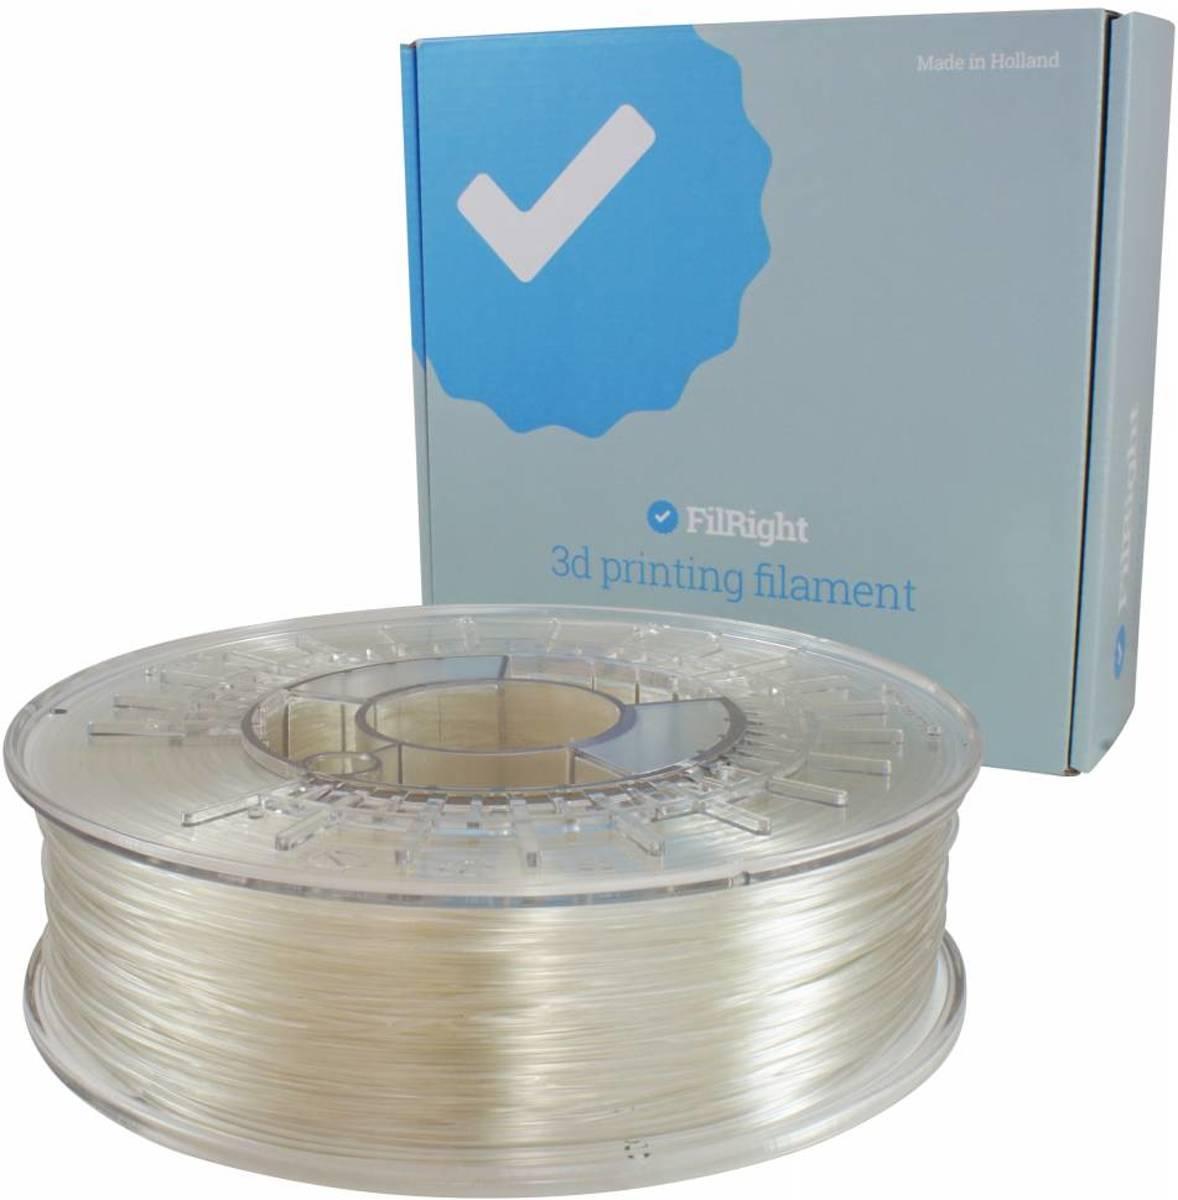 FilRight Pro PP PolyPropylene 1.75mm 3D Printer Filament 0,5kg Transparant